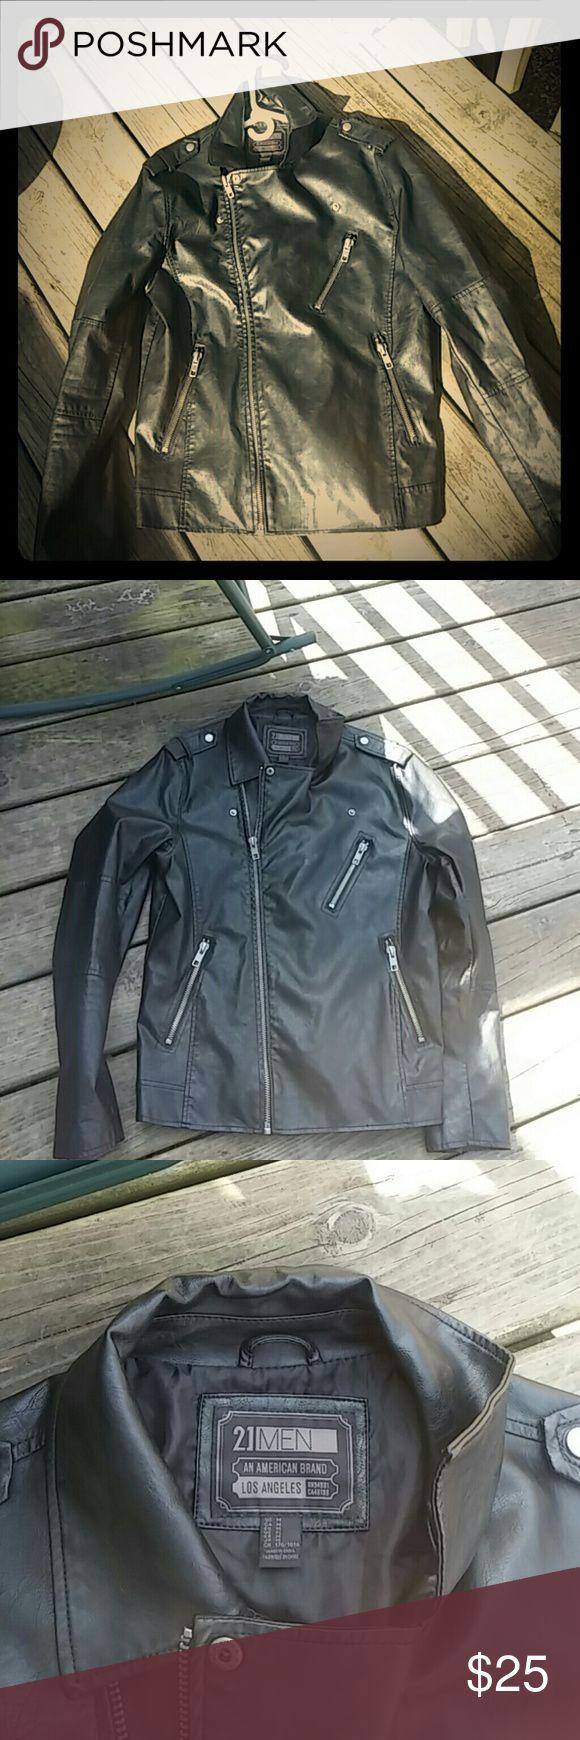 21Men Jacket SZ M CN 170/101A 21men Jackets & Coats